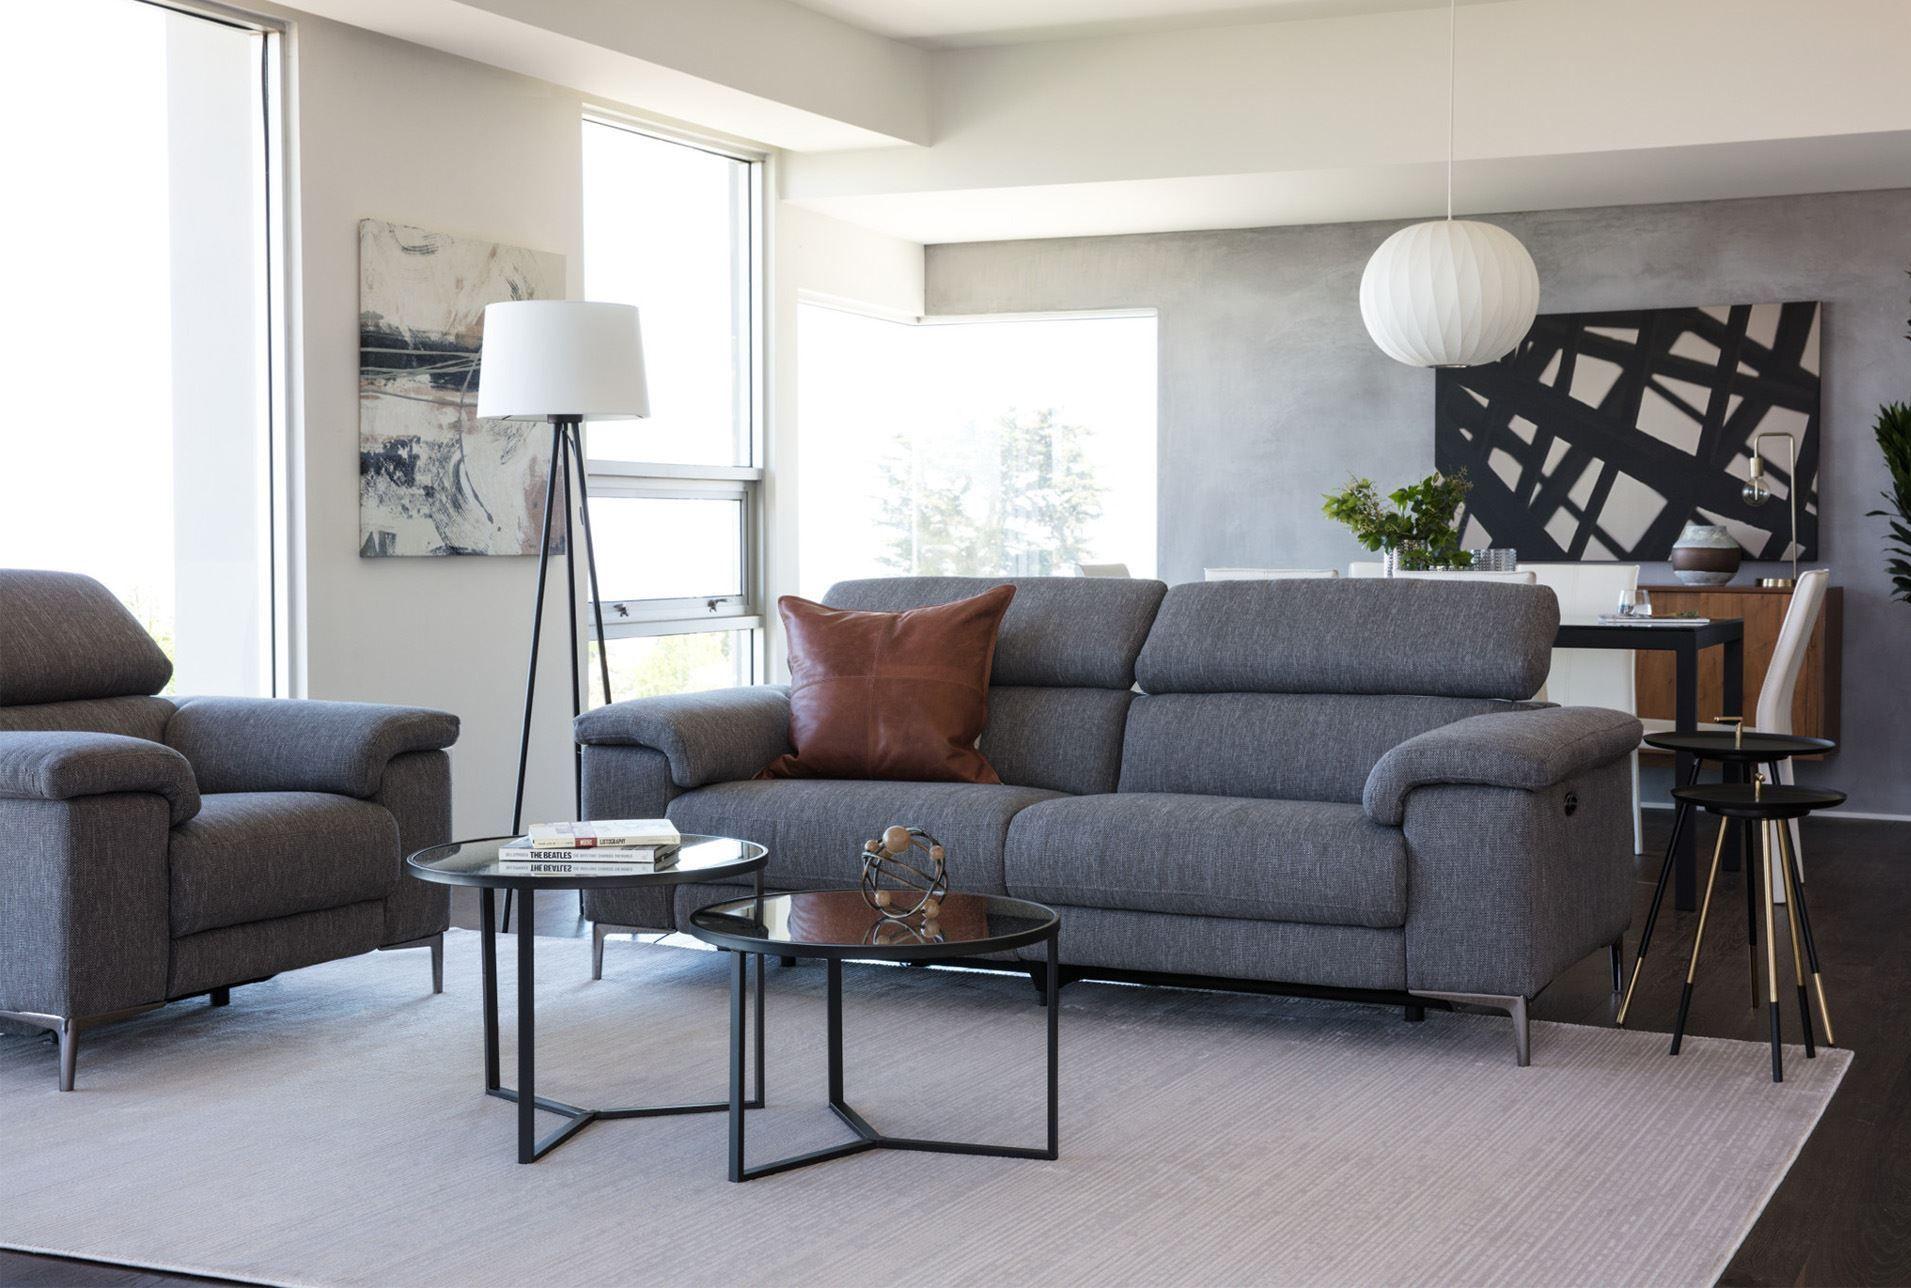 Talin Grey Power Reclining Sofa W Usb In 2020 Reclining Sofa Living Room Power Reclining Sofa Grey Sofa Living Room